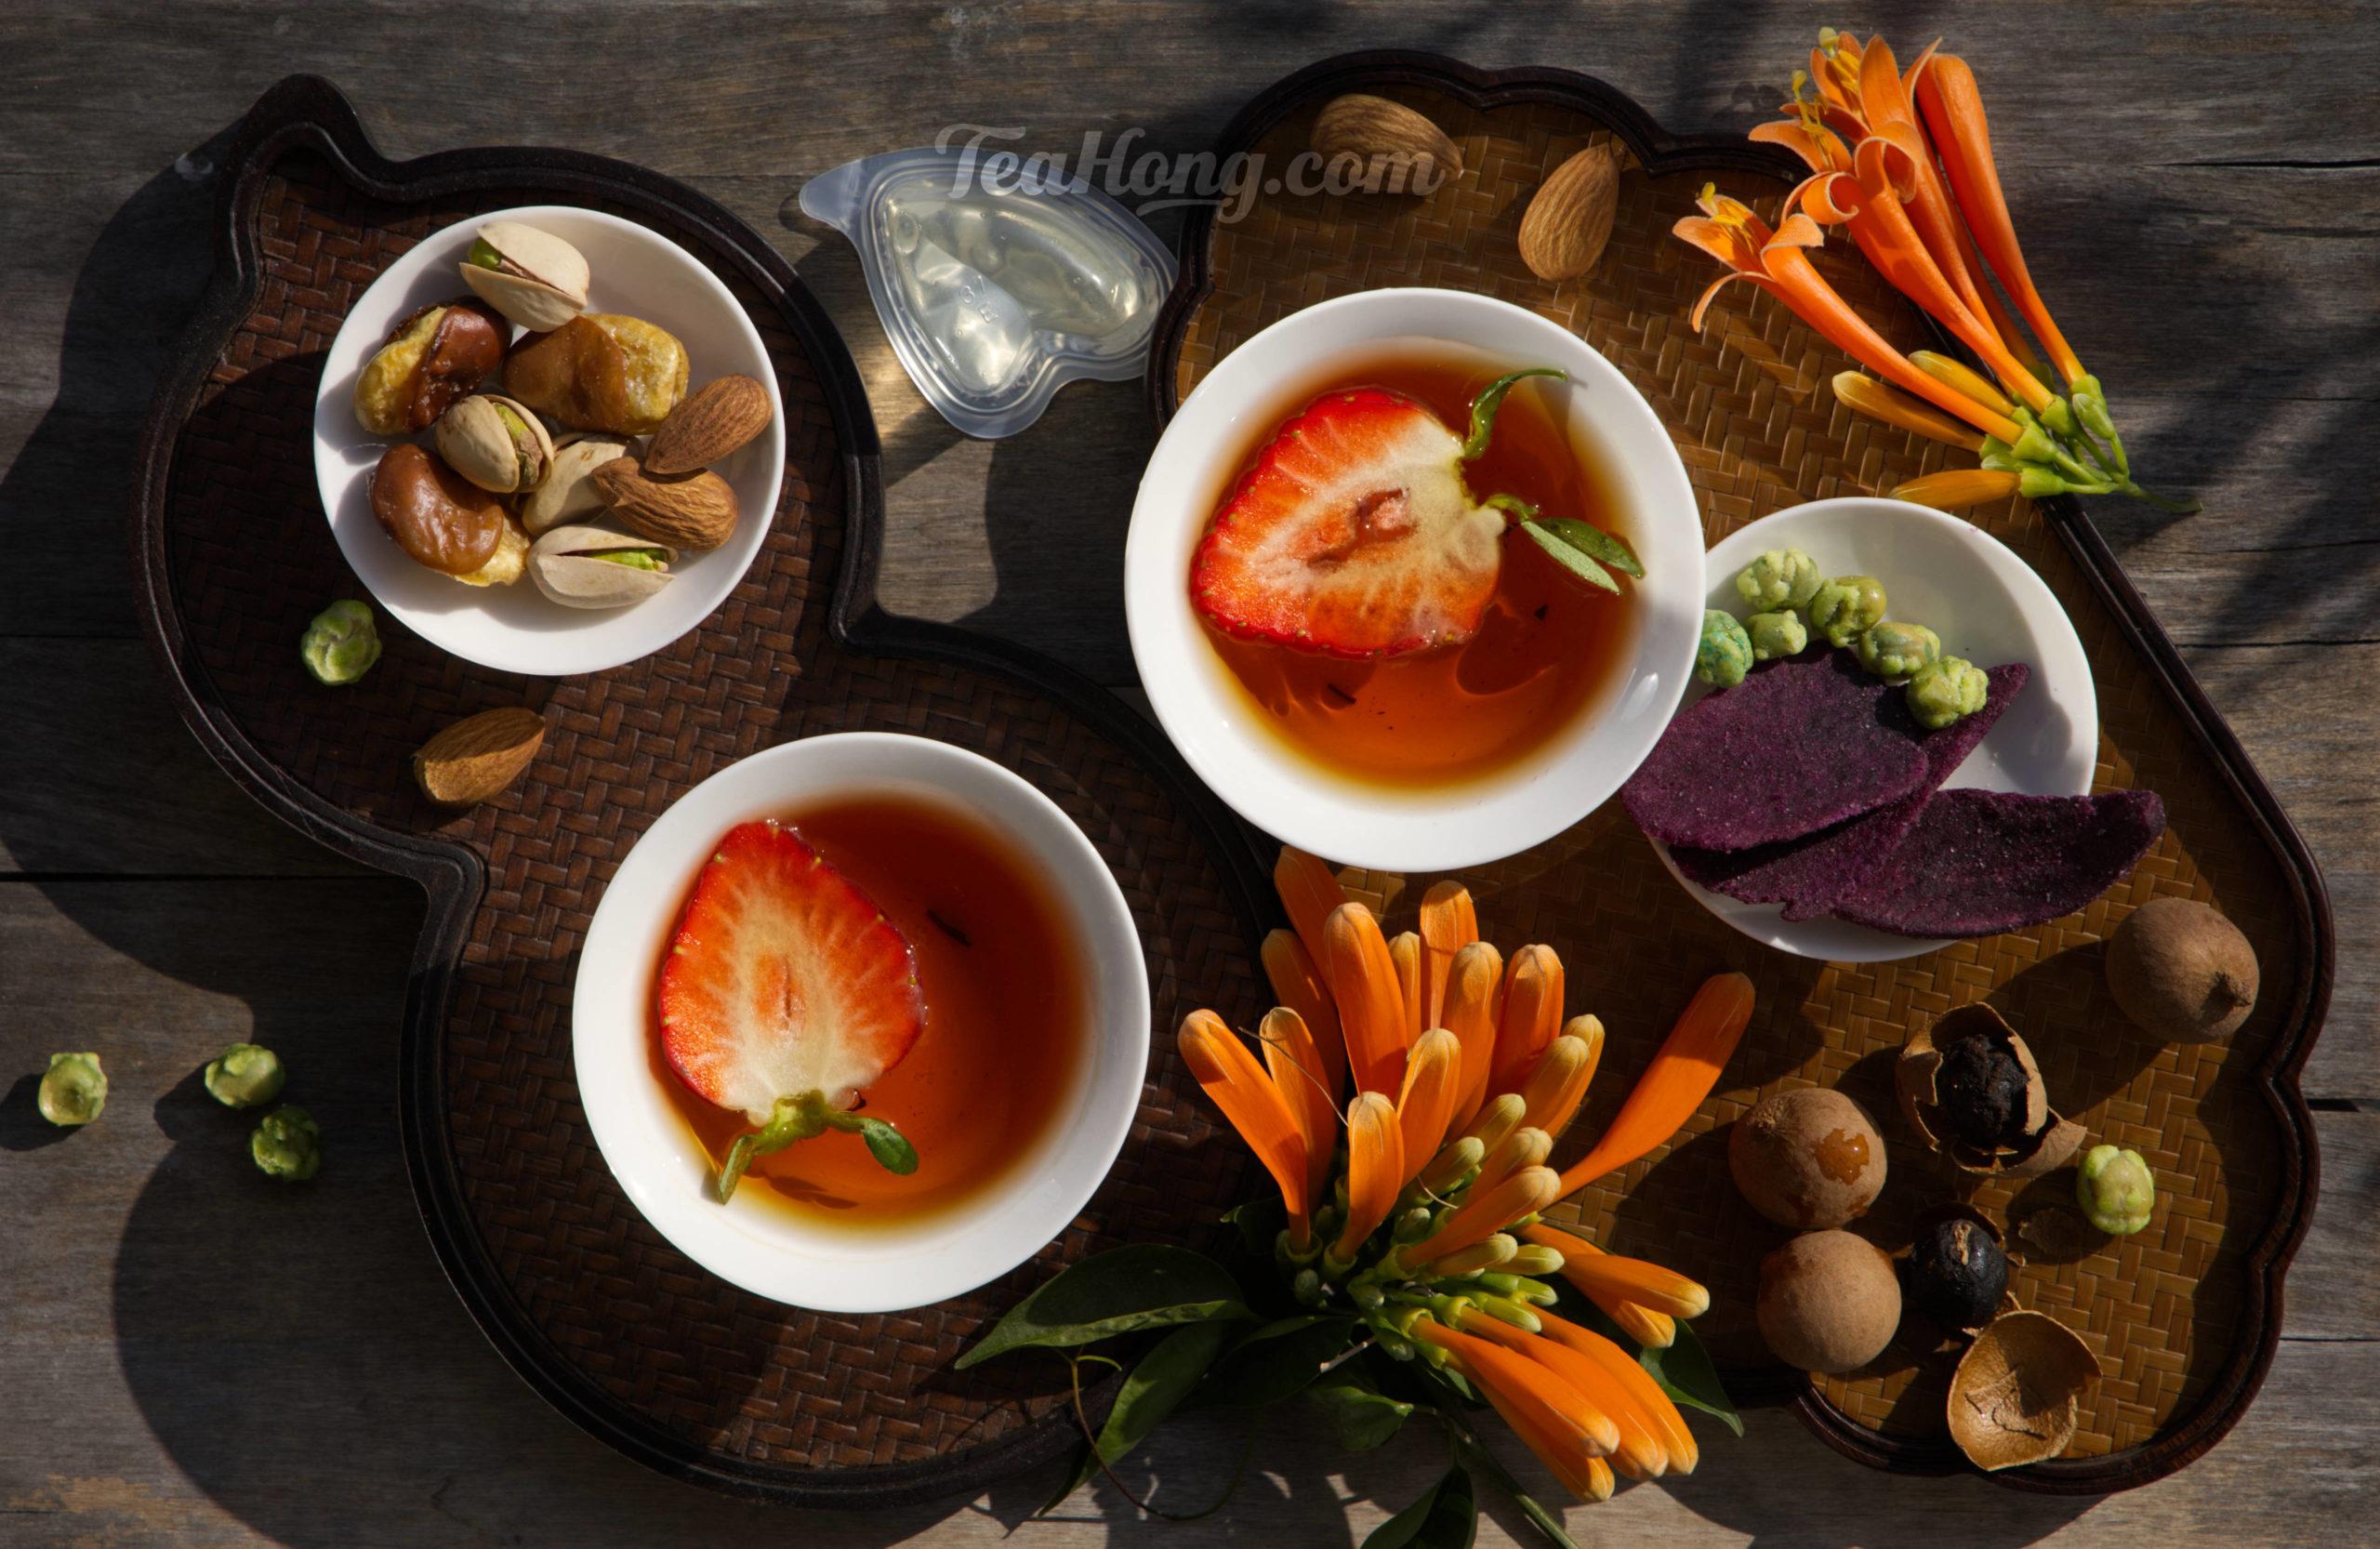 Keemun black tea with strawberry as condiment